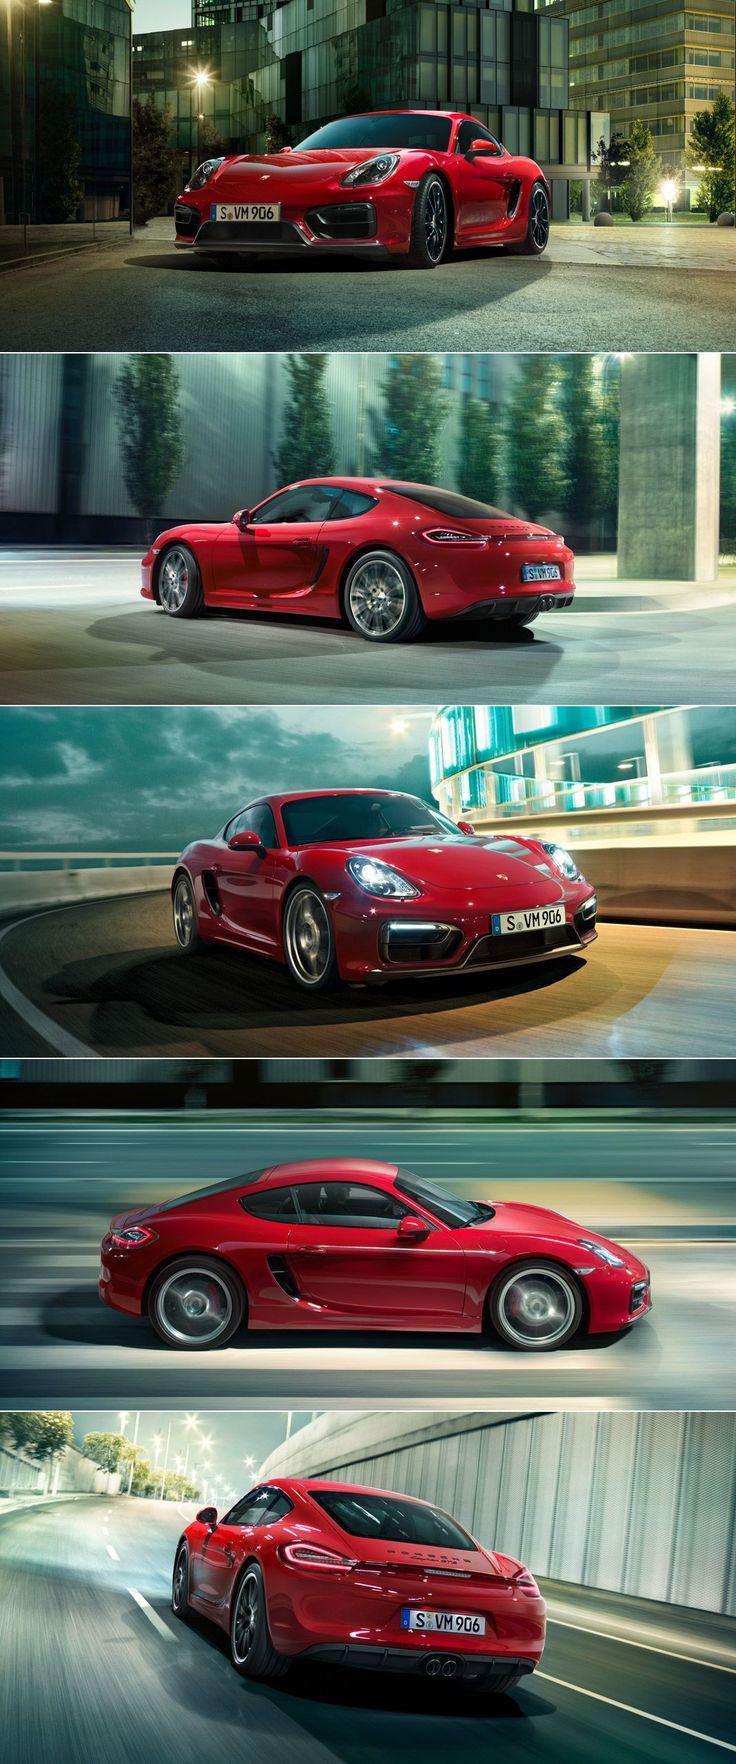 Porsche Cayman rot https://www.amazon.co.uk/Baby-Car-Mirror-Shatterproof-Installation/dp/B06XHG6SSY